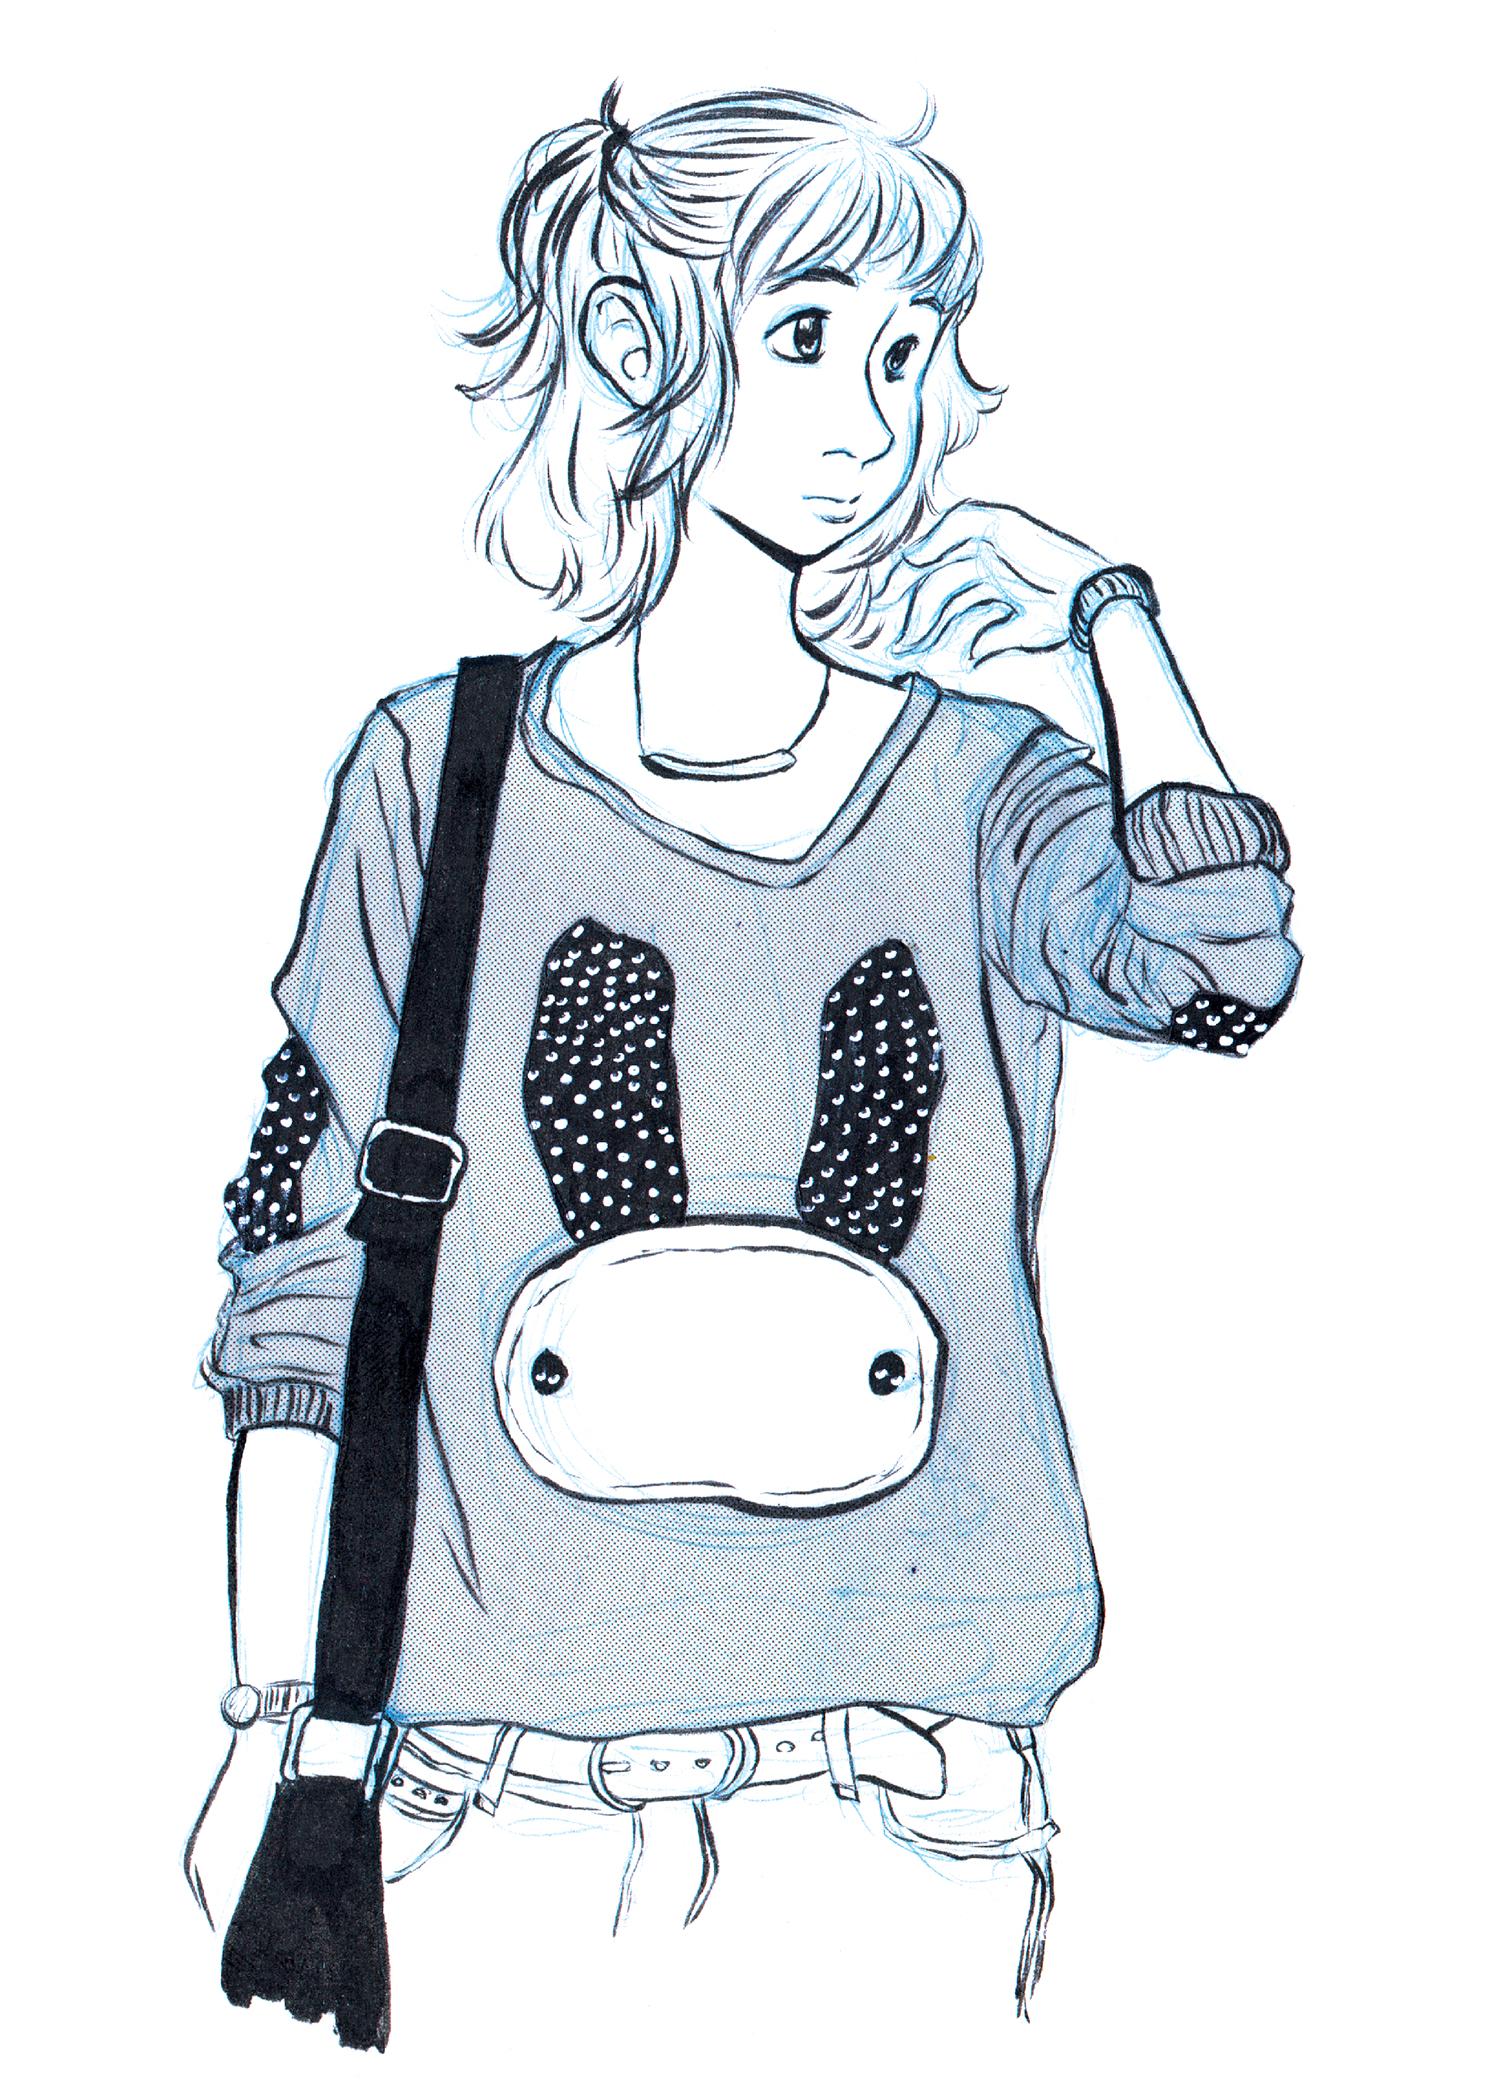 GirlBunnySweater_5x7.jpg